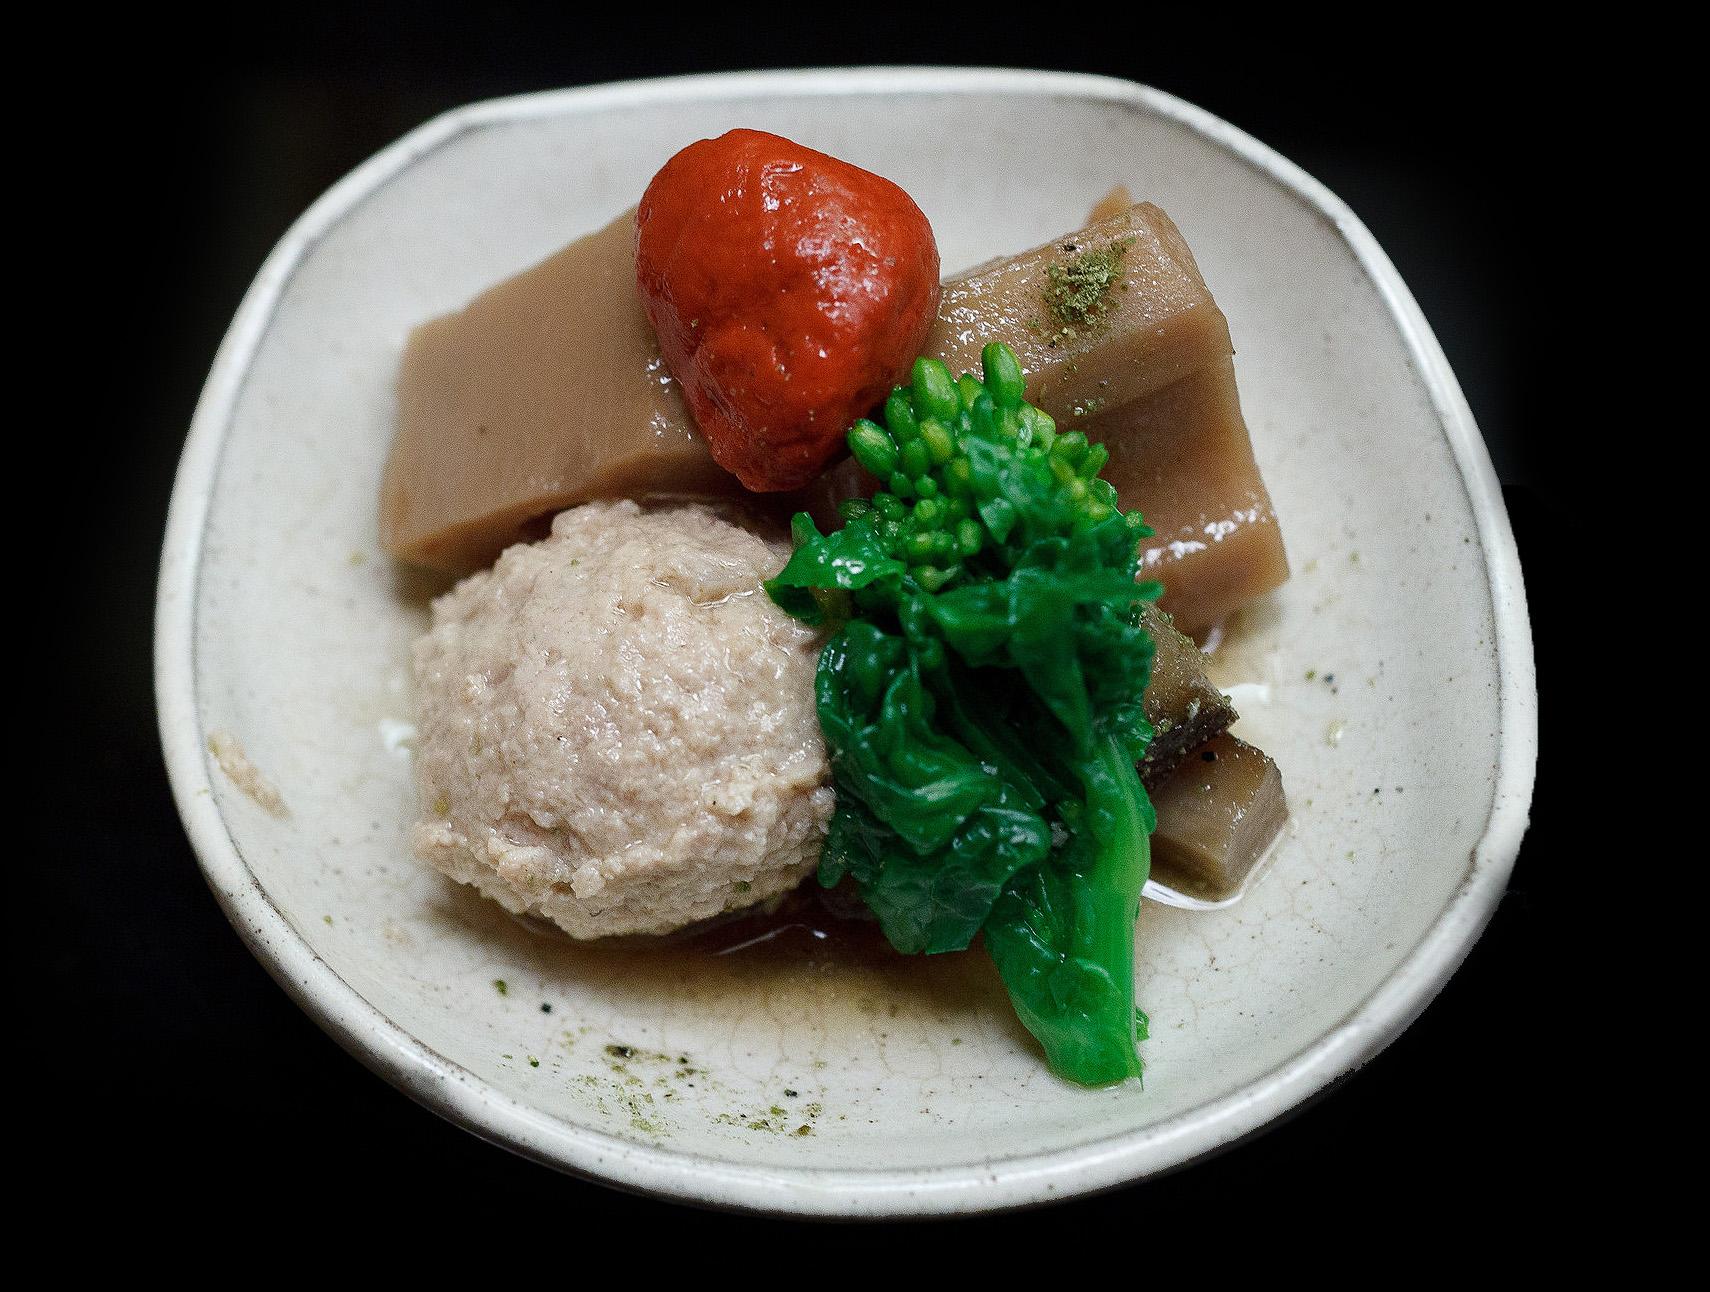 Chihana, Kyoto, Japan - Lotus Root, Pickled Plum, Chicken ball, and Burdock root